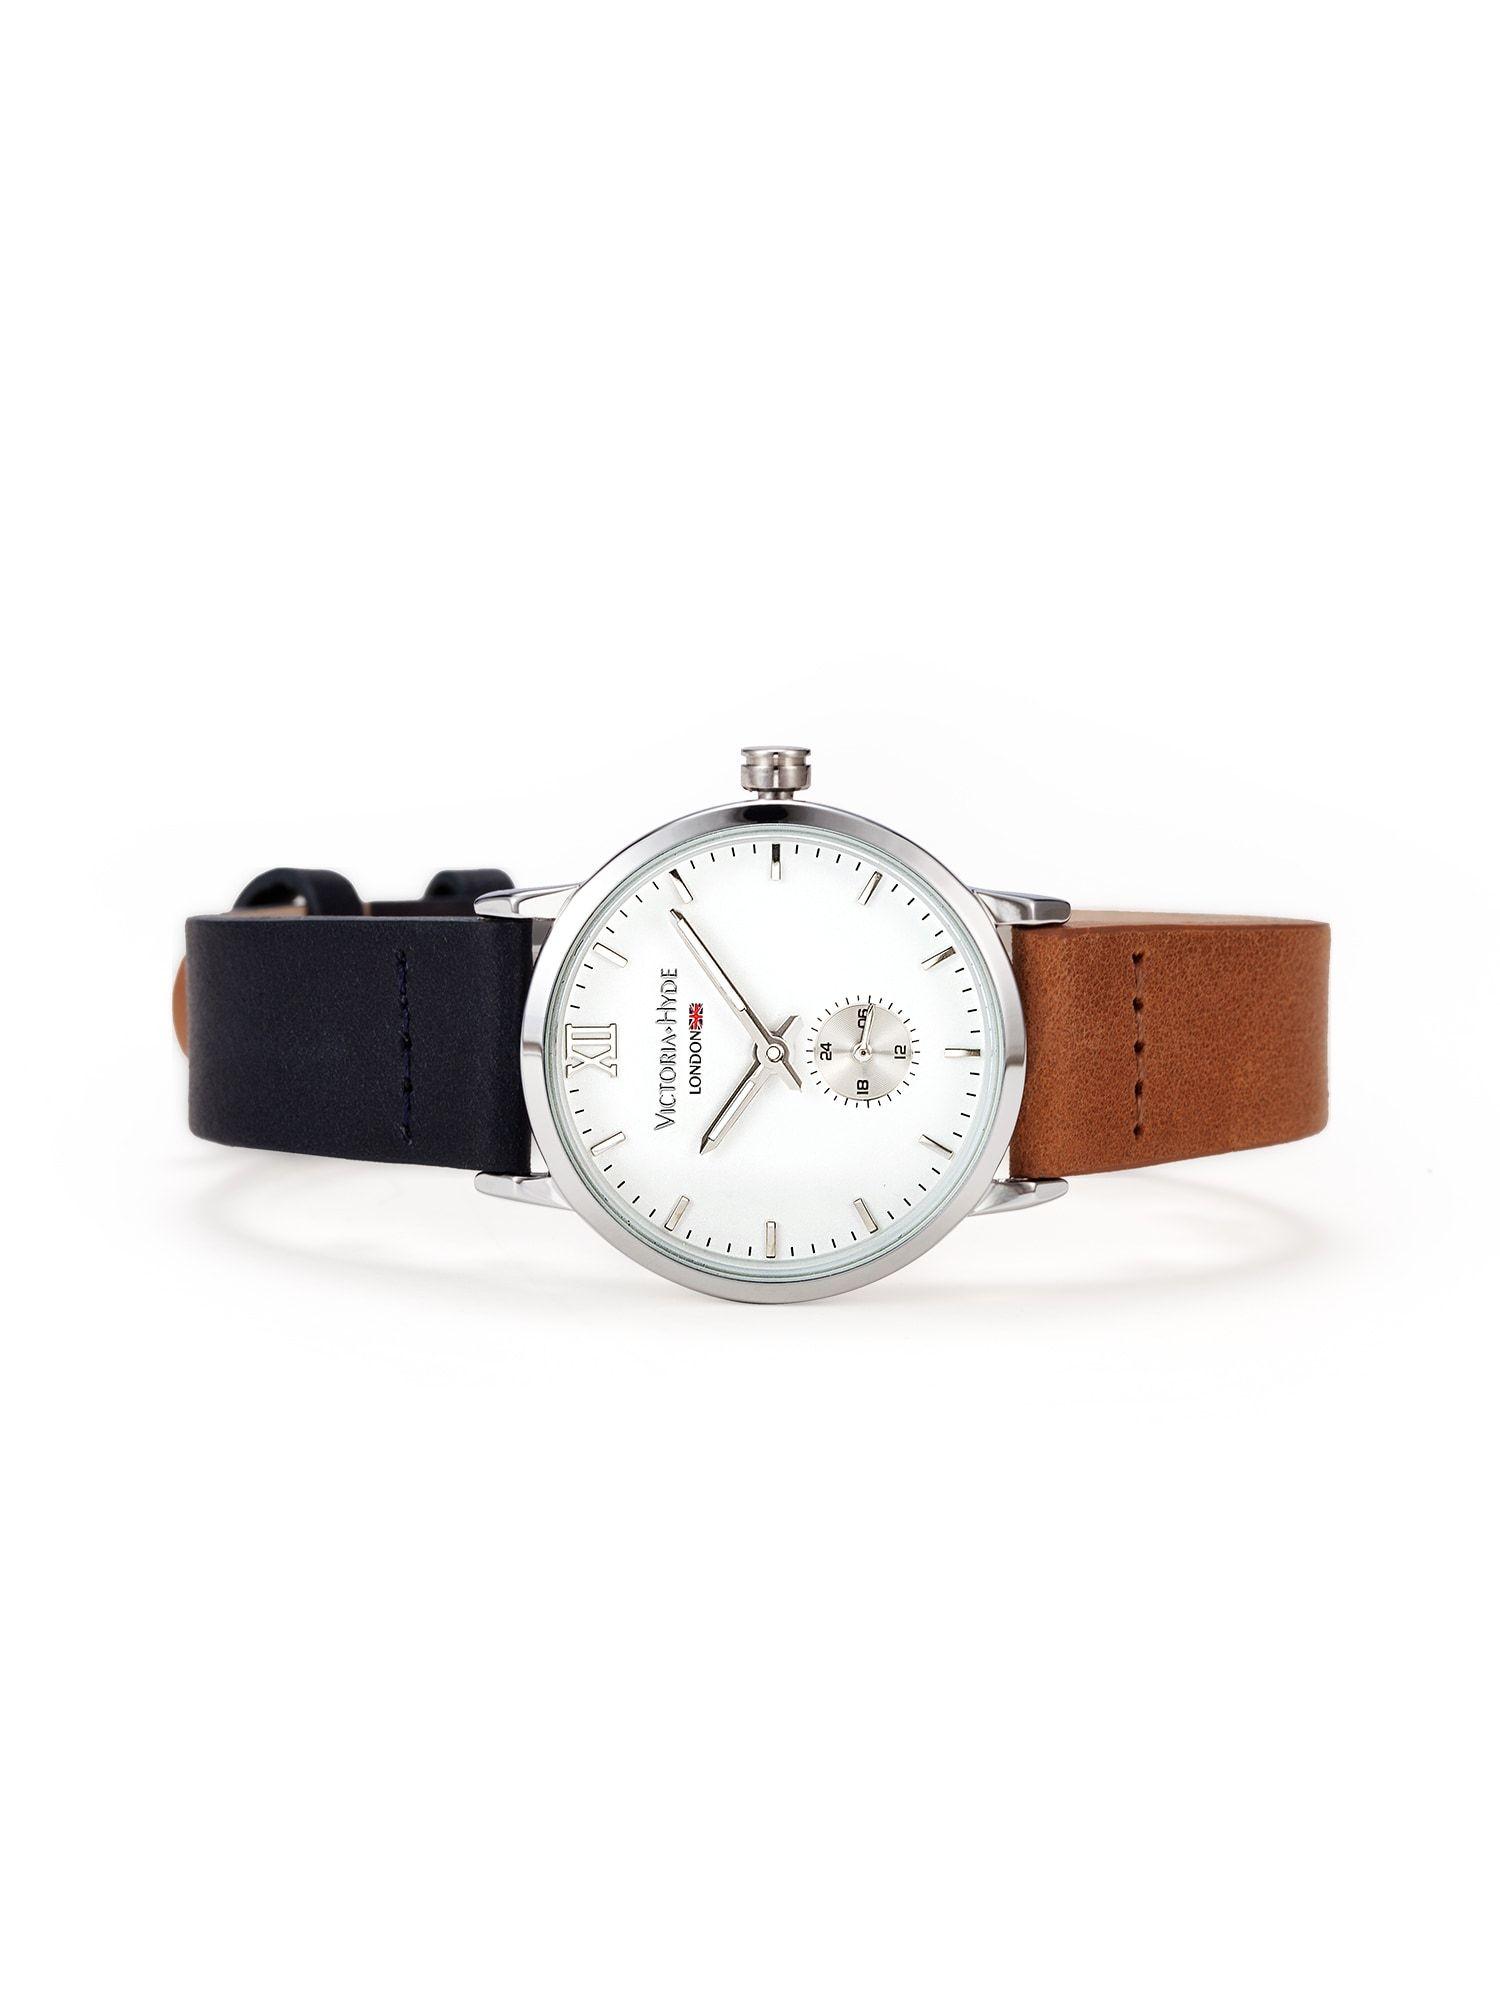 Victoria Hyde Armbanduhr Damen, Kobaltblau / Rostbraun / Silber / Weiß, Größe One Size